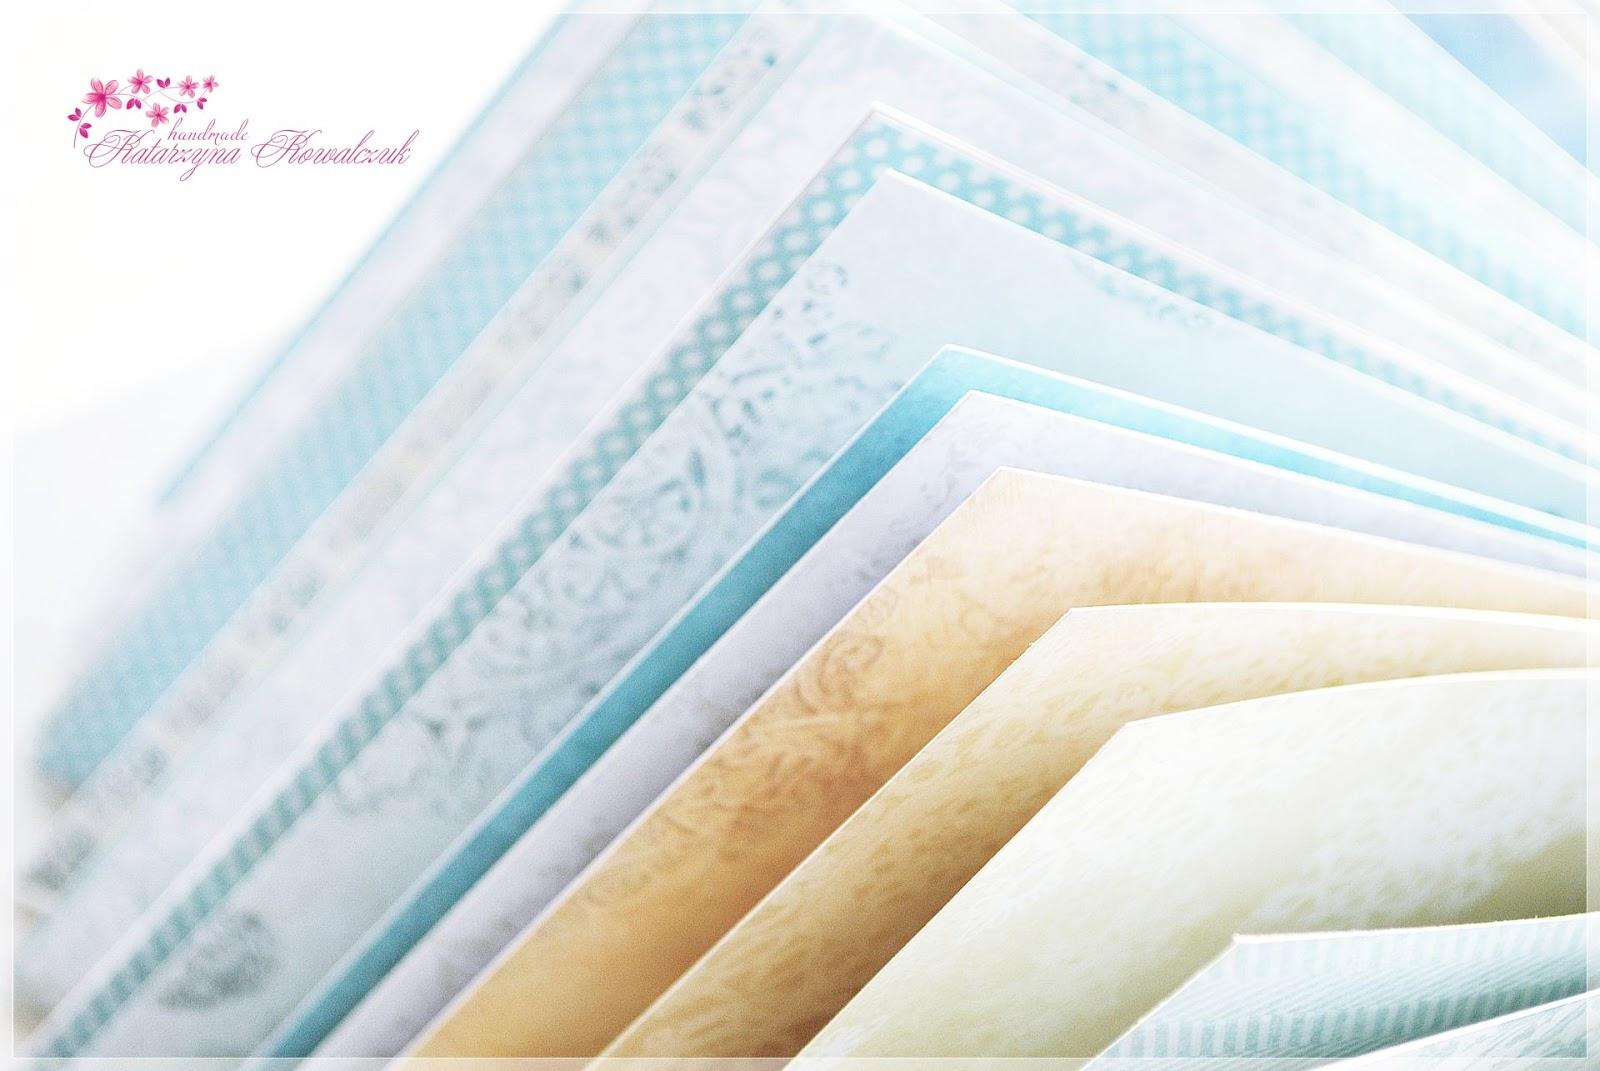 album pamiątka chrztu świętego scrapbooking